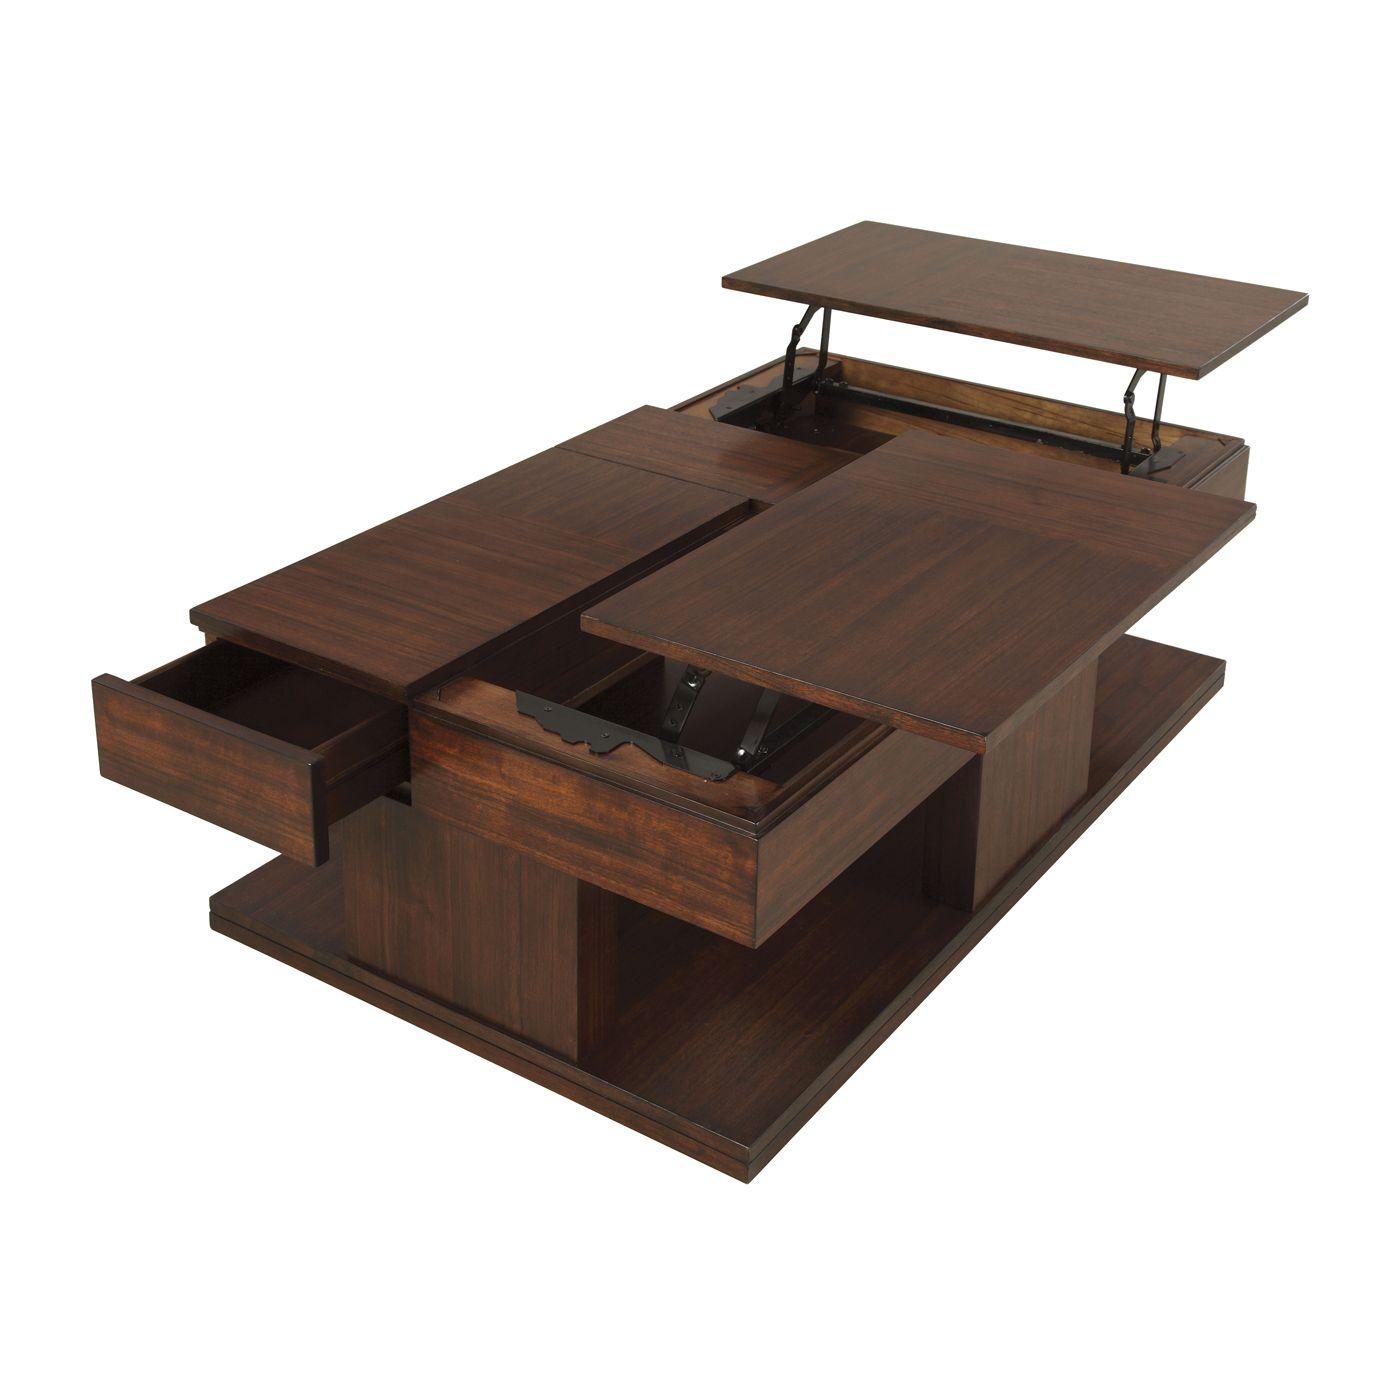 Progressive Furniture P561 25 Le Mans Double Lift Top Cocktail Coffee Table  | ATG